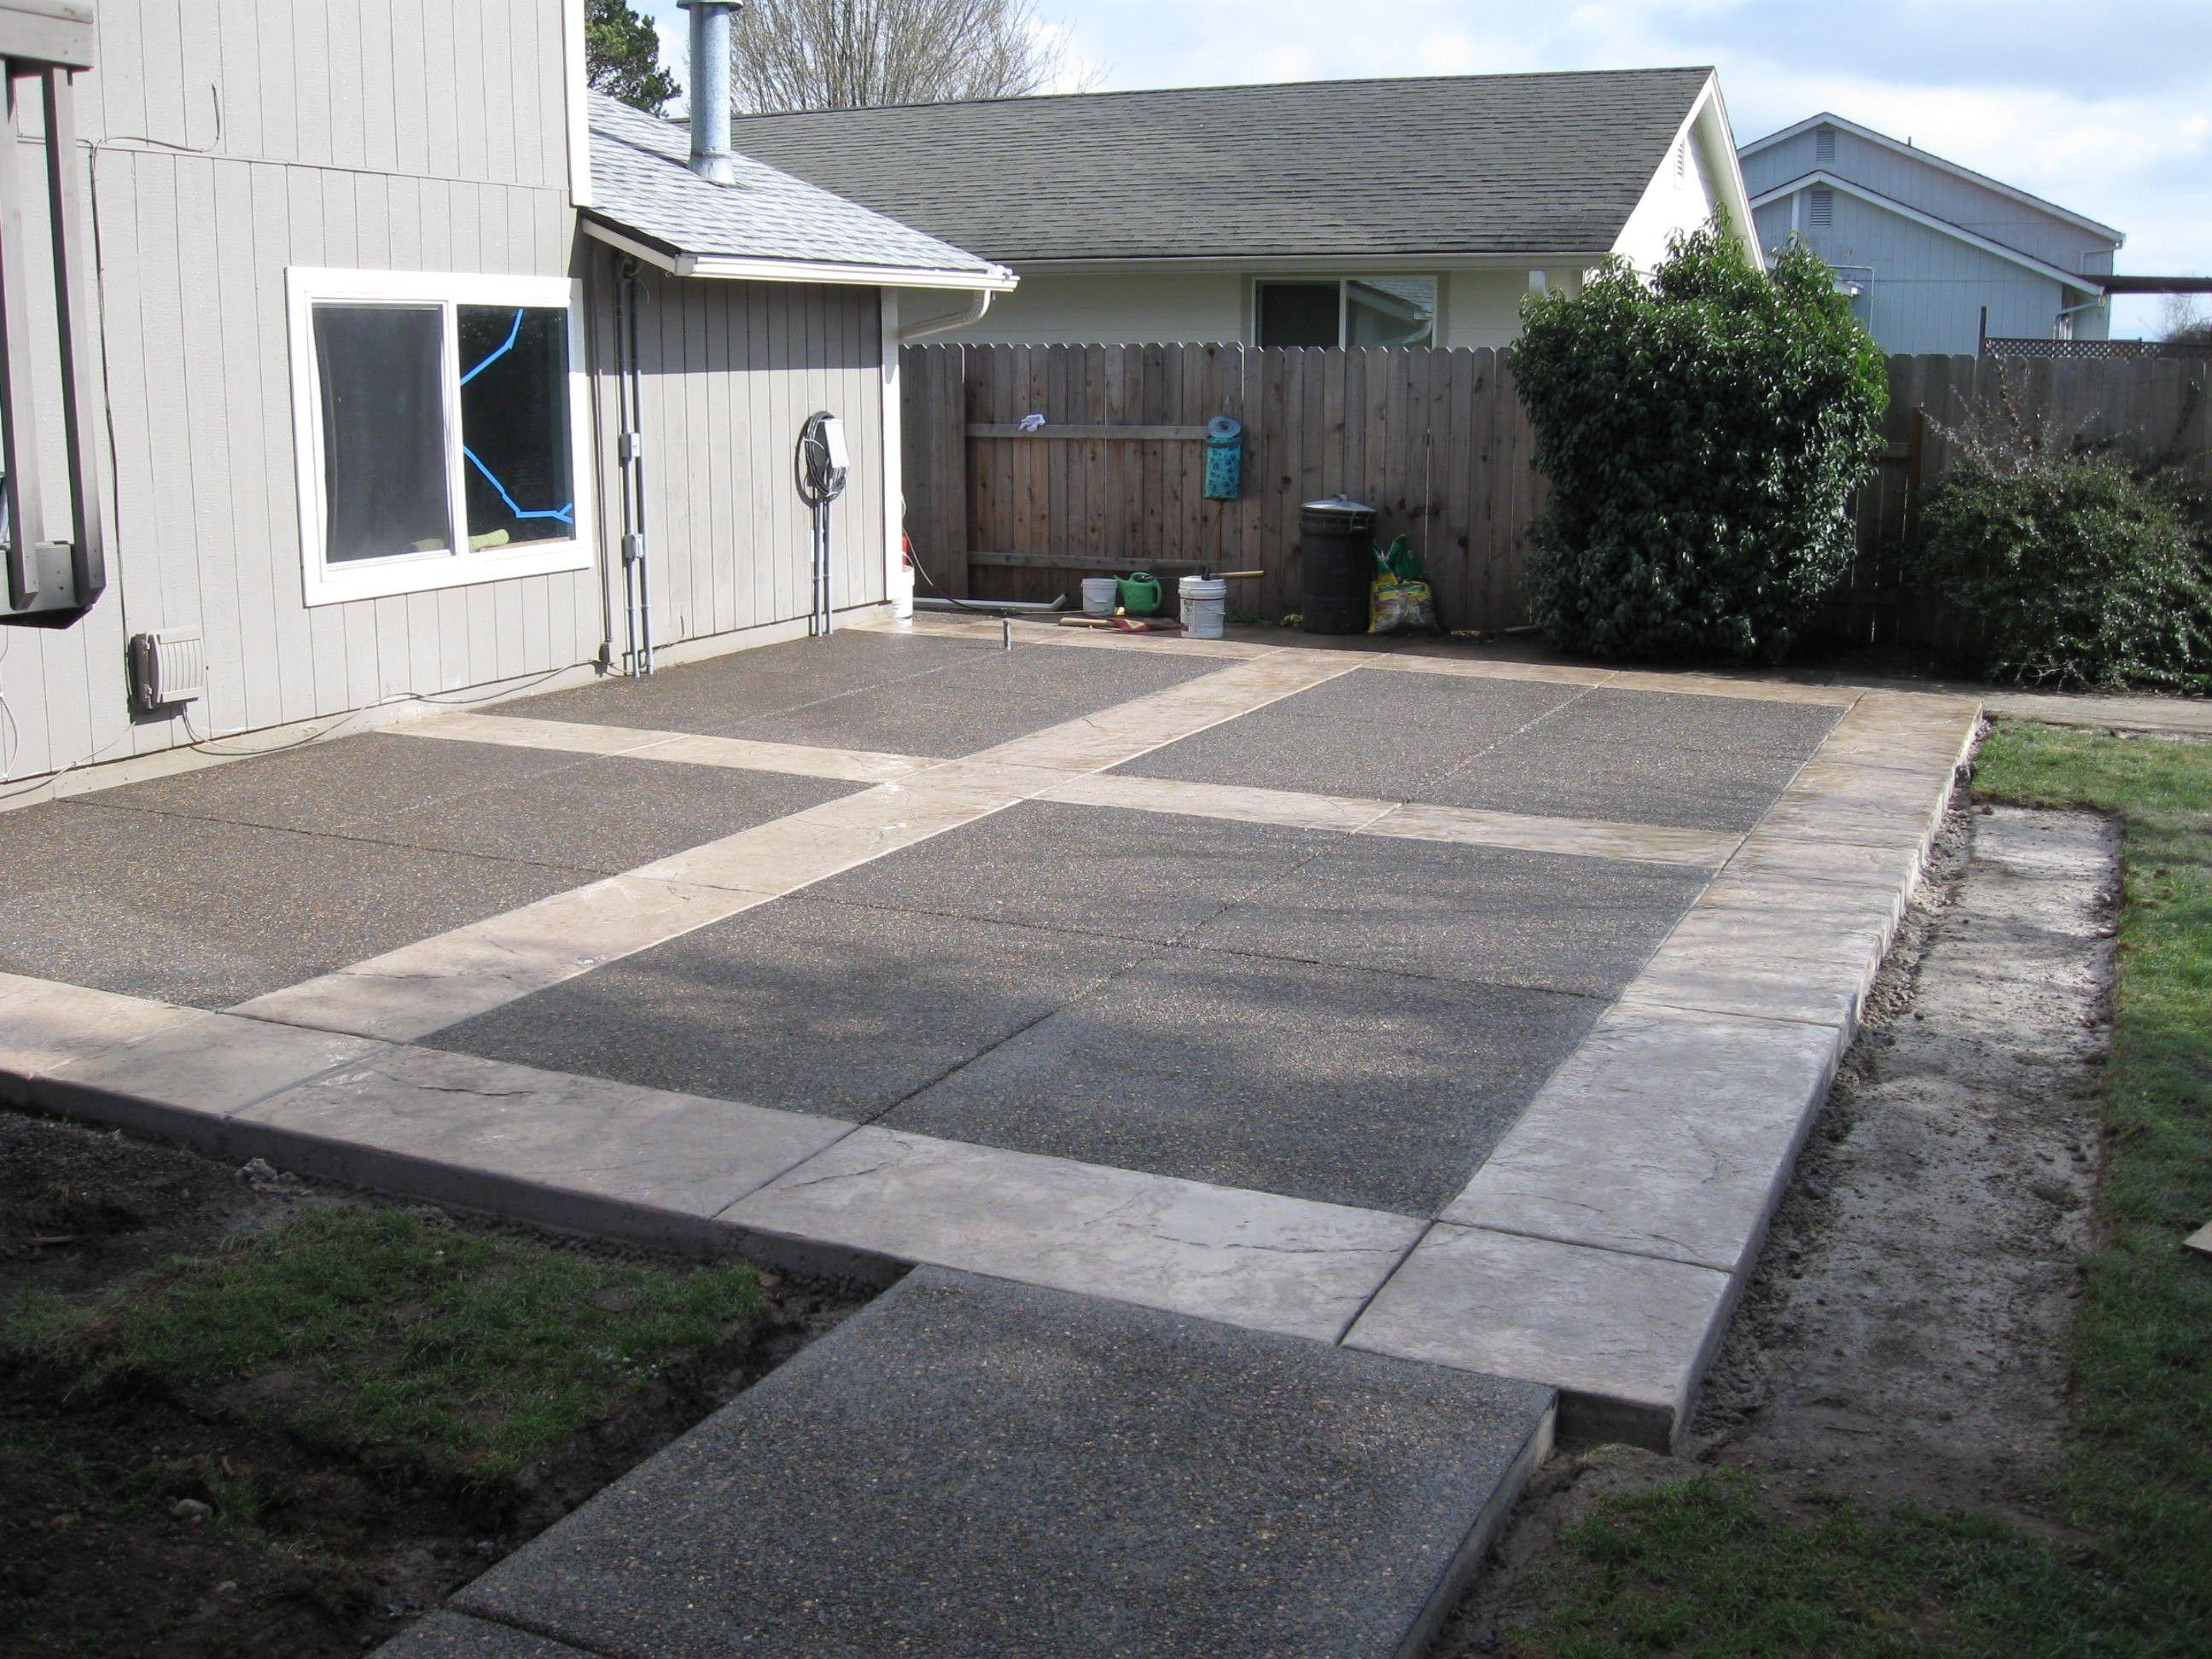 easy cement backyards  Google Search  backyard  Concrete patio designs Patio Patio design